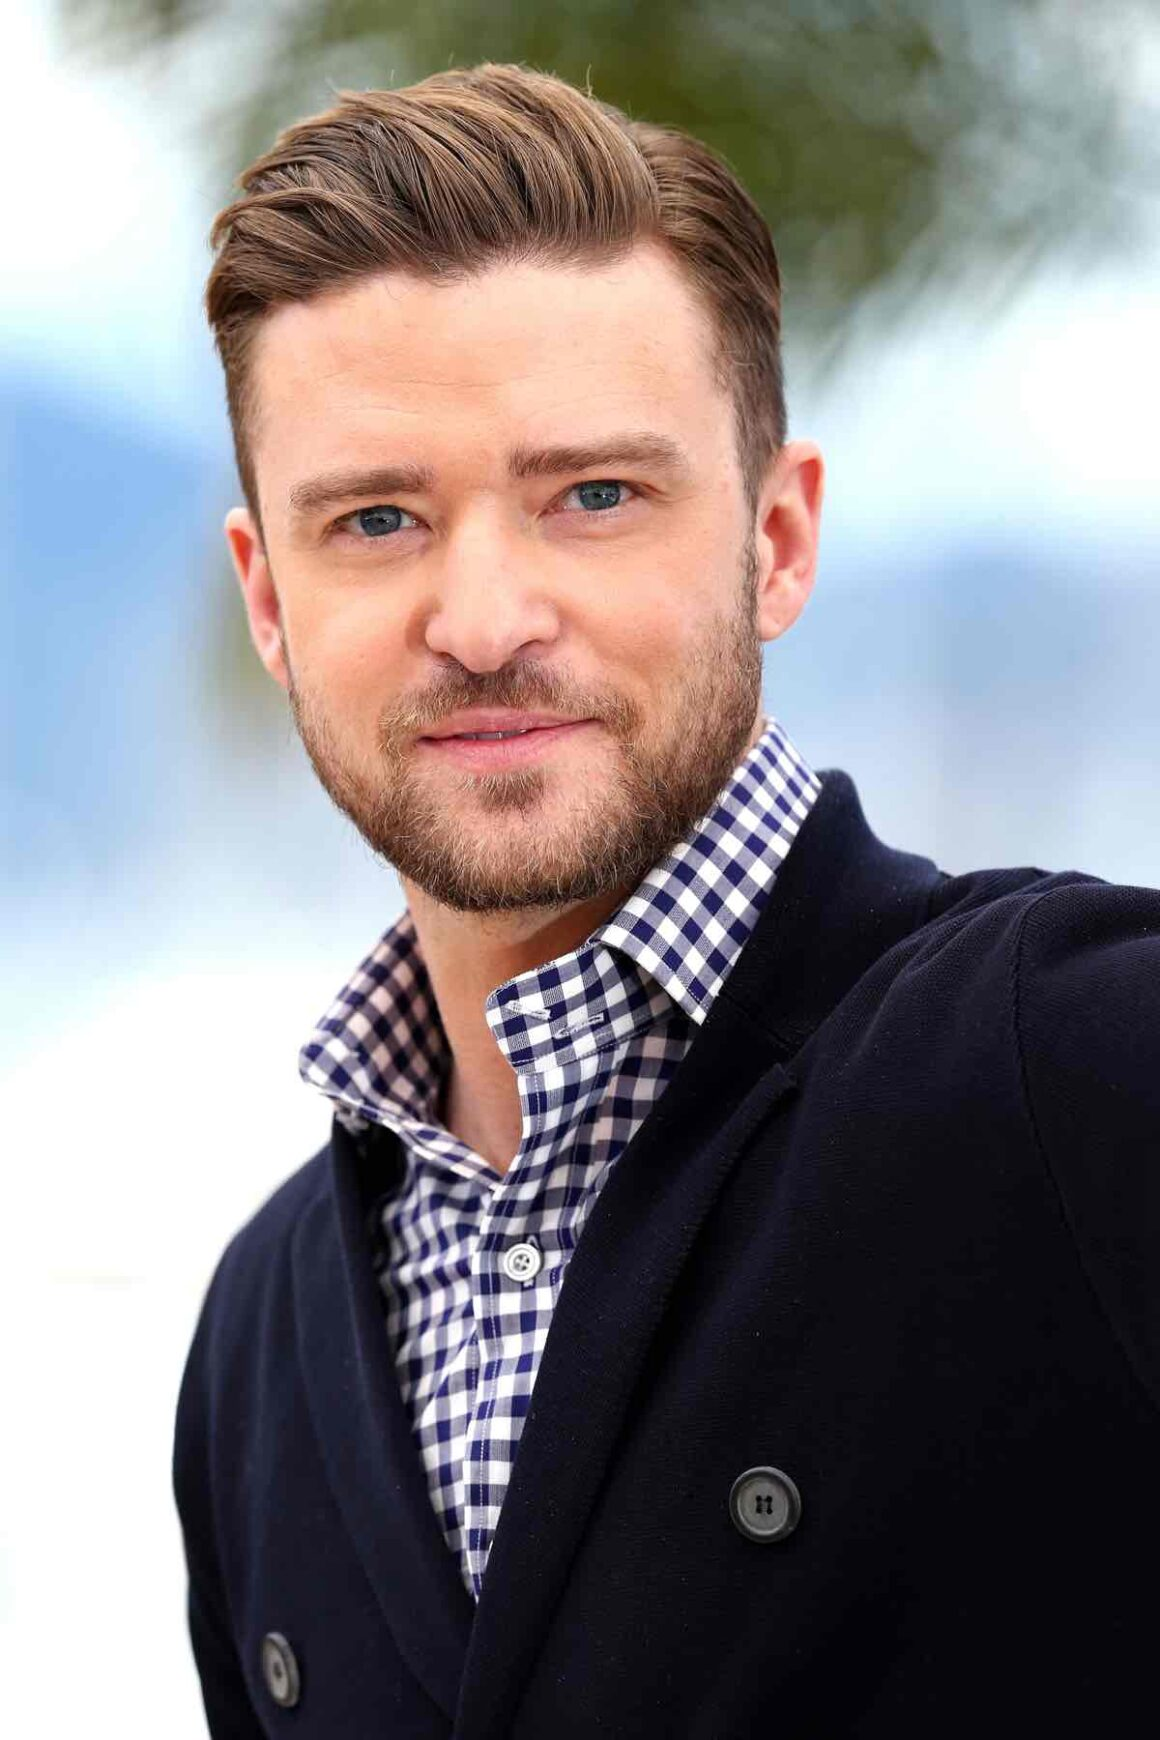 Justin Timberlake 'Inside Llewyn Davis' Photocall - The 66th Annual Cannes Film Festival